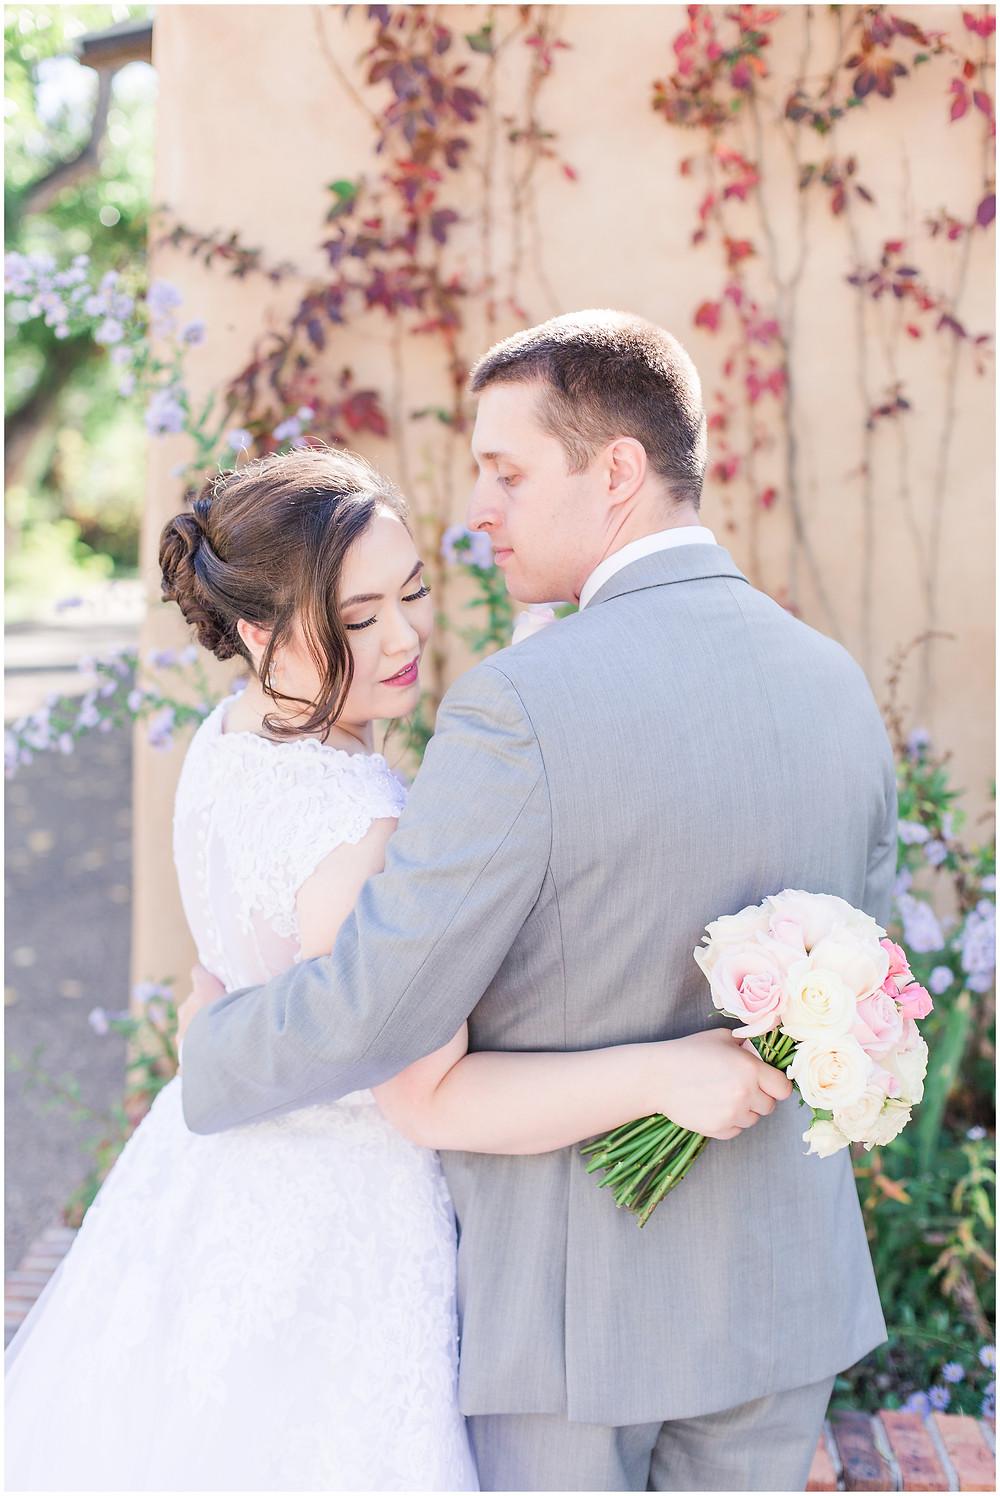 Los Poblanos wedding venue. Los Poblanos wedding. New Mexico wedding photographer. Albuquerque wedding photographer. Ballgown wedding dress. Pink rose bouquet. Elegant bouquet. Classic bouquet. Small bouquet. Adobe wedding.